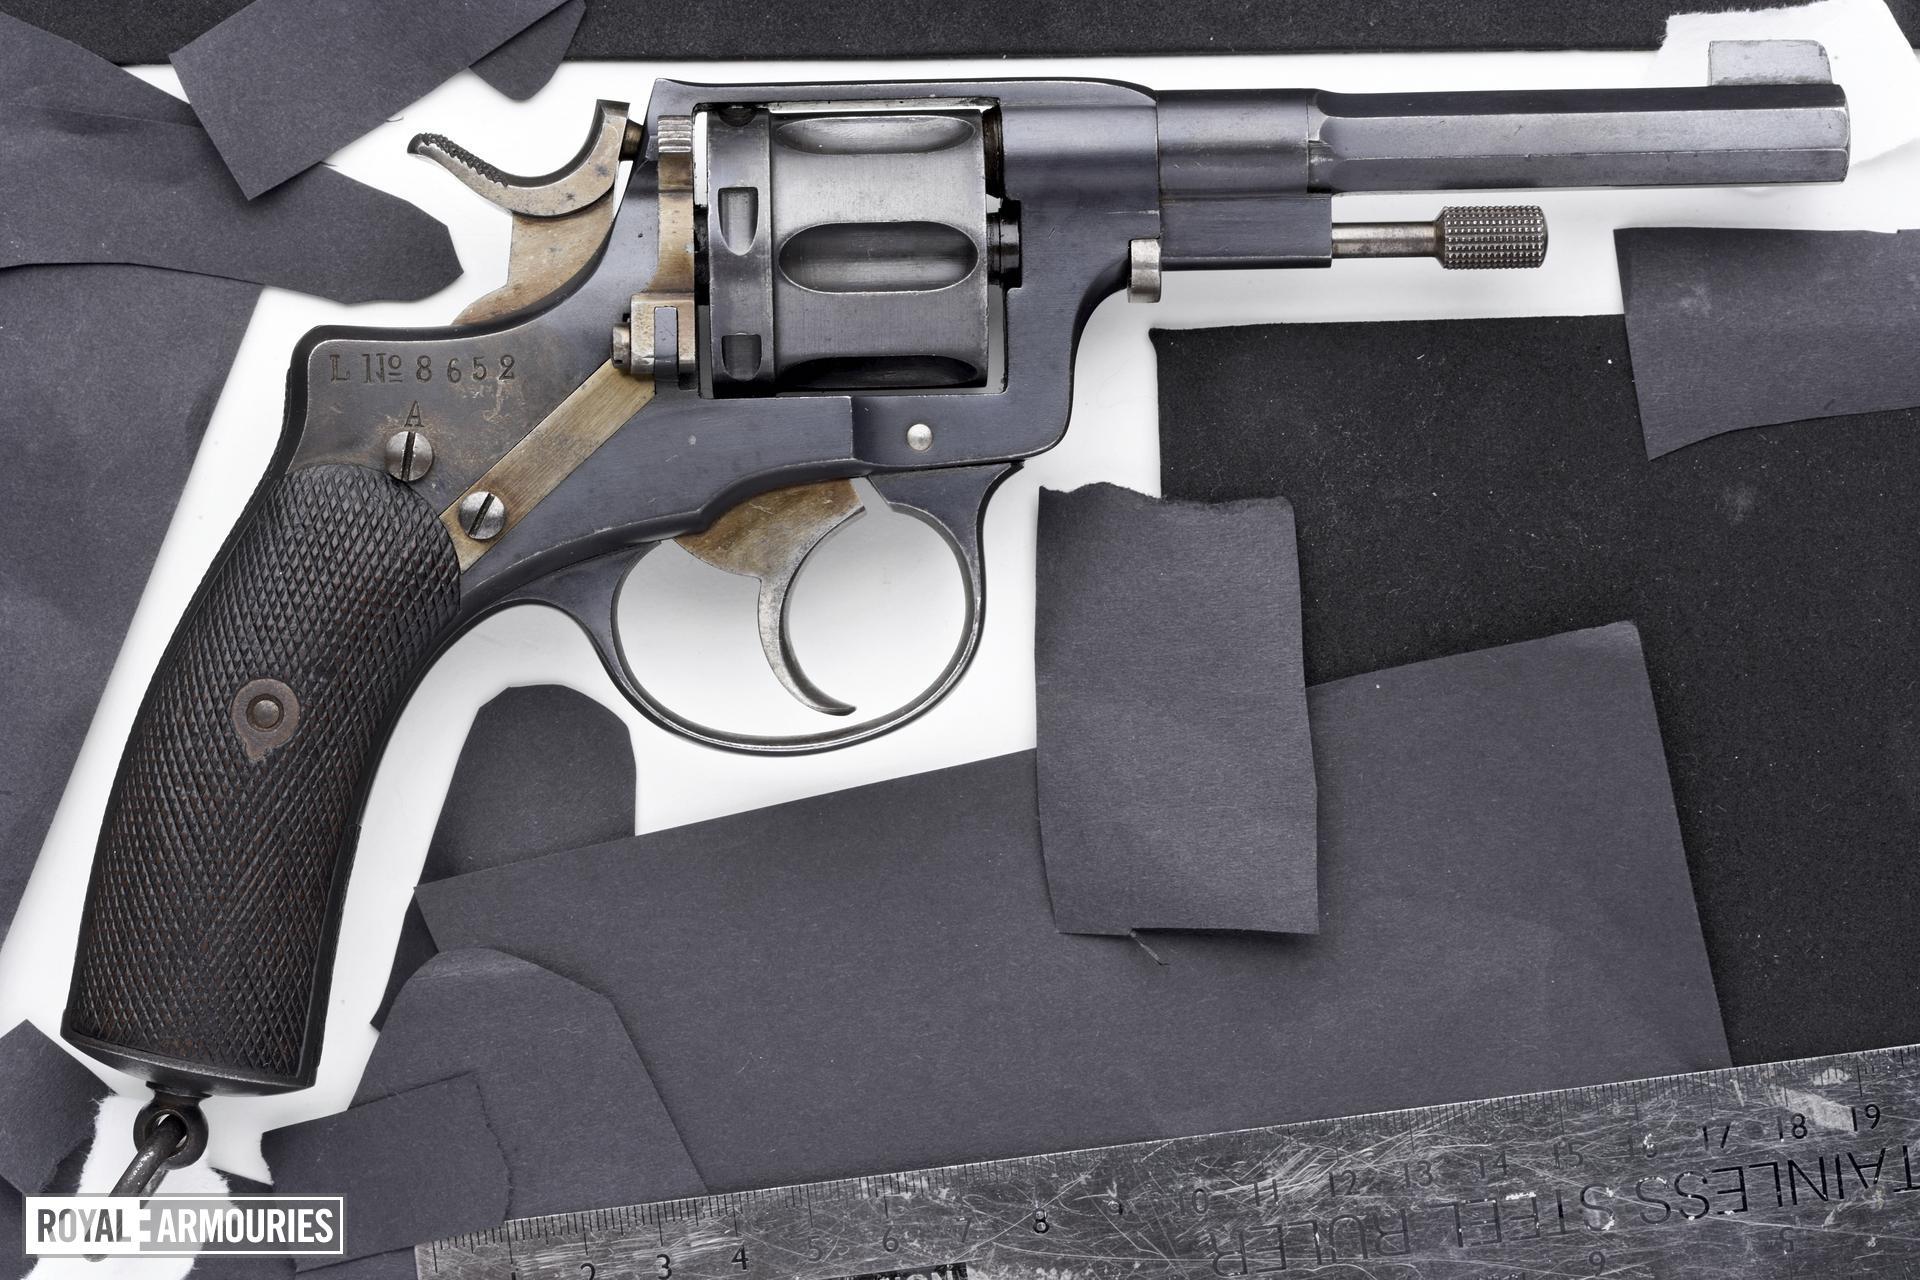 Centrefire six-shot revolver - Nagant Model 1887